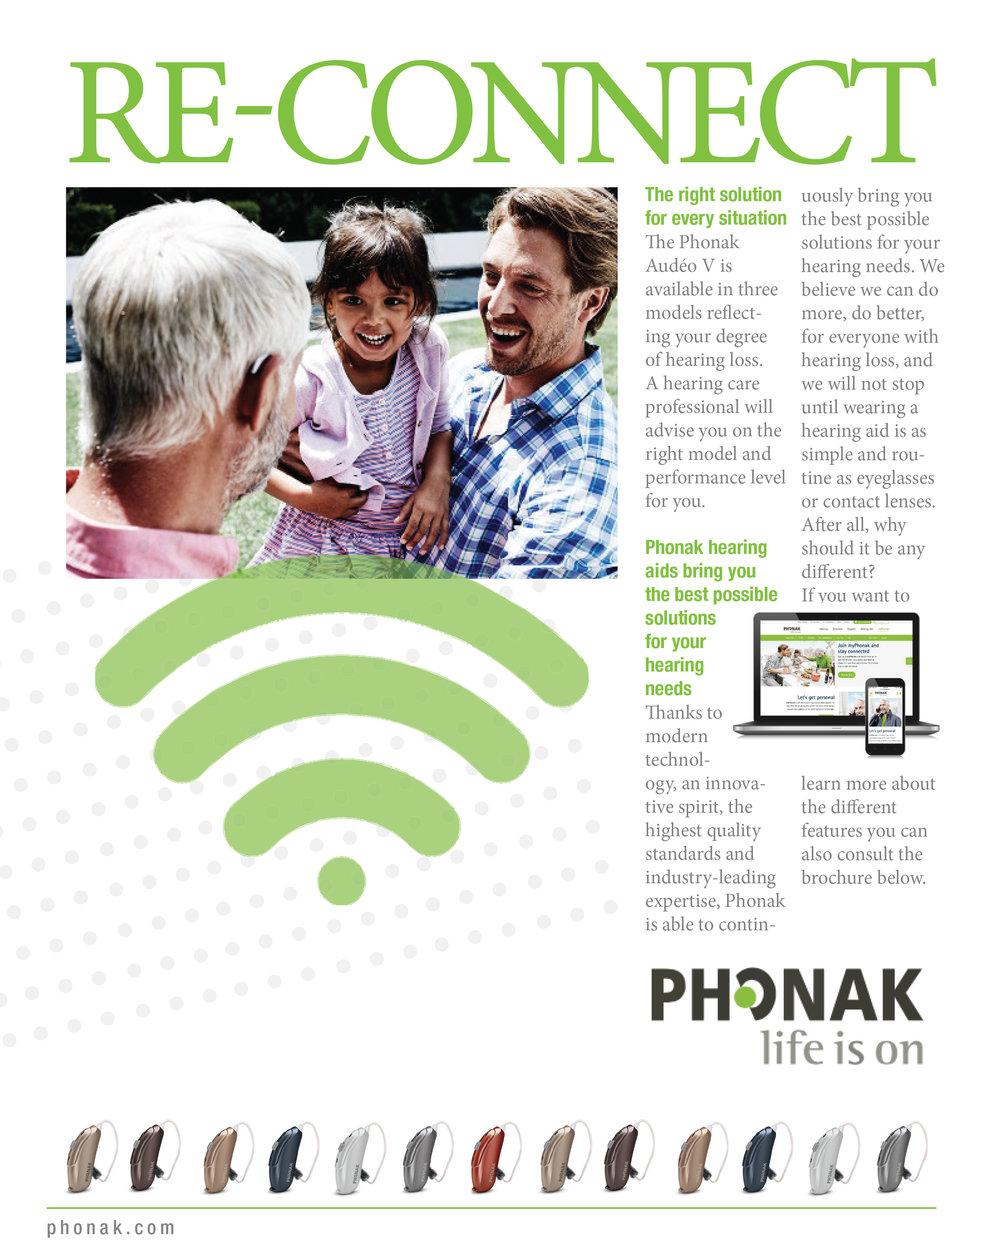 Phonak_Ads_11_2017-2.jpg